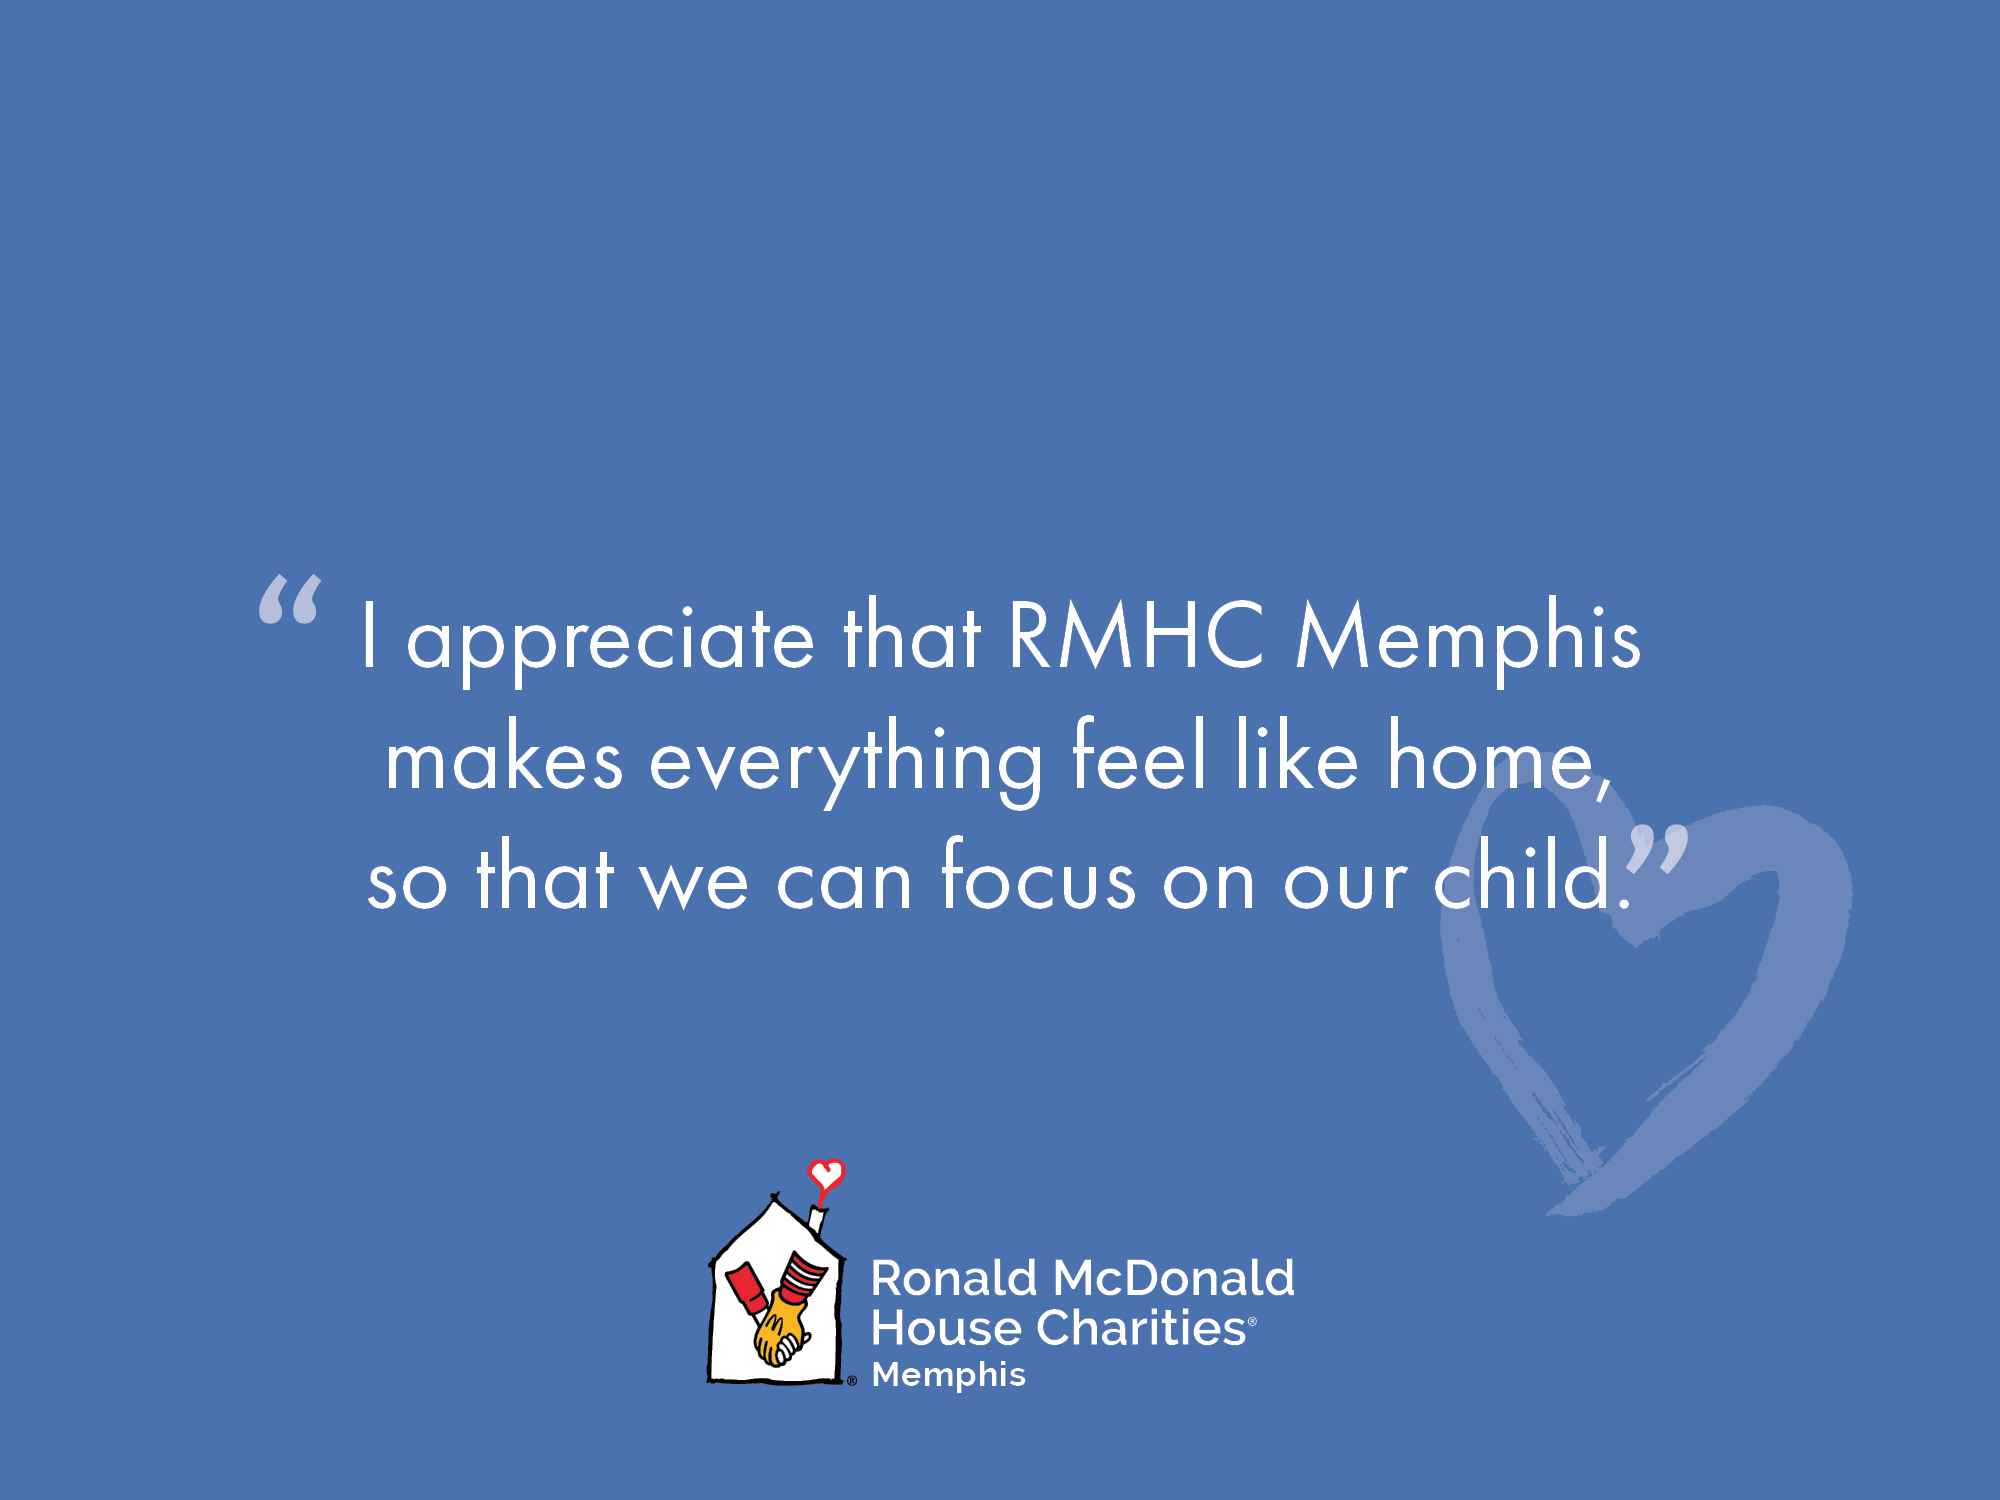 Ronald McDonald House of Memphis